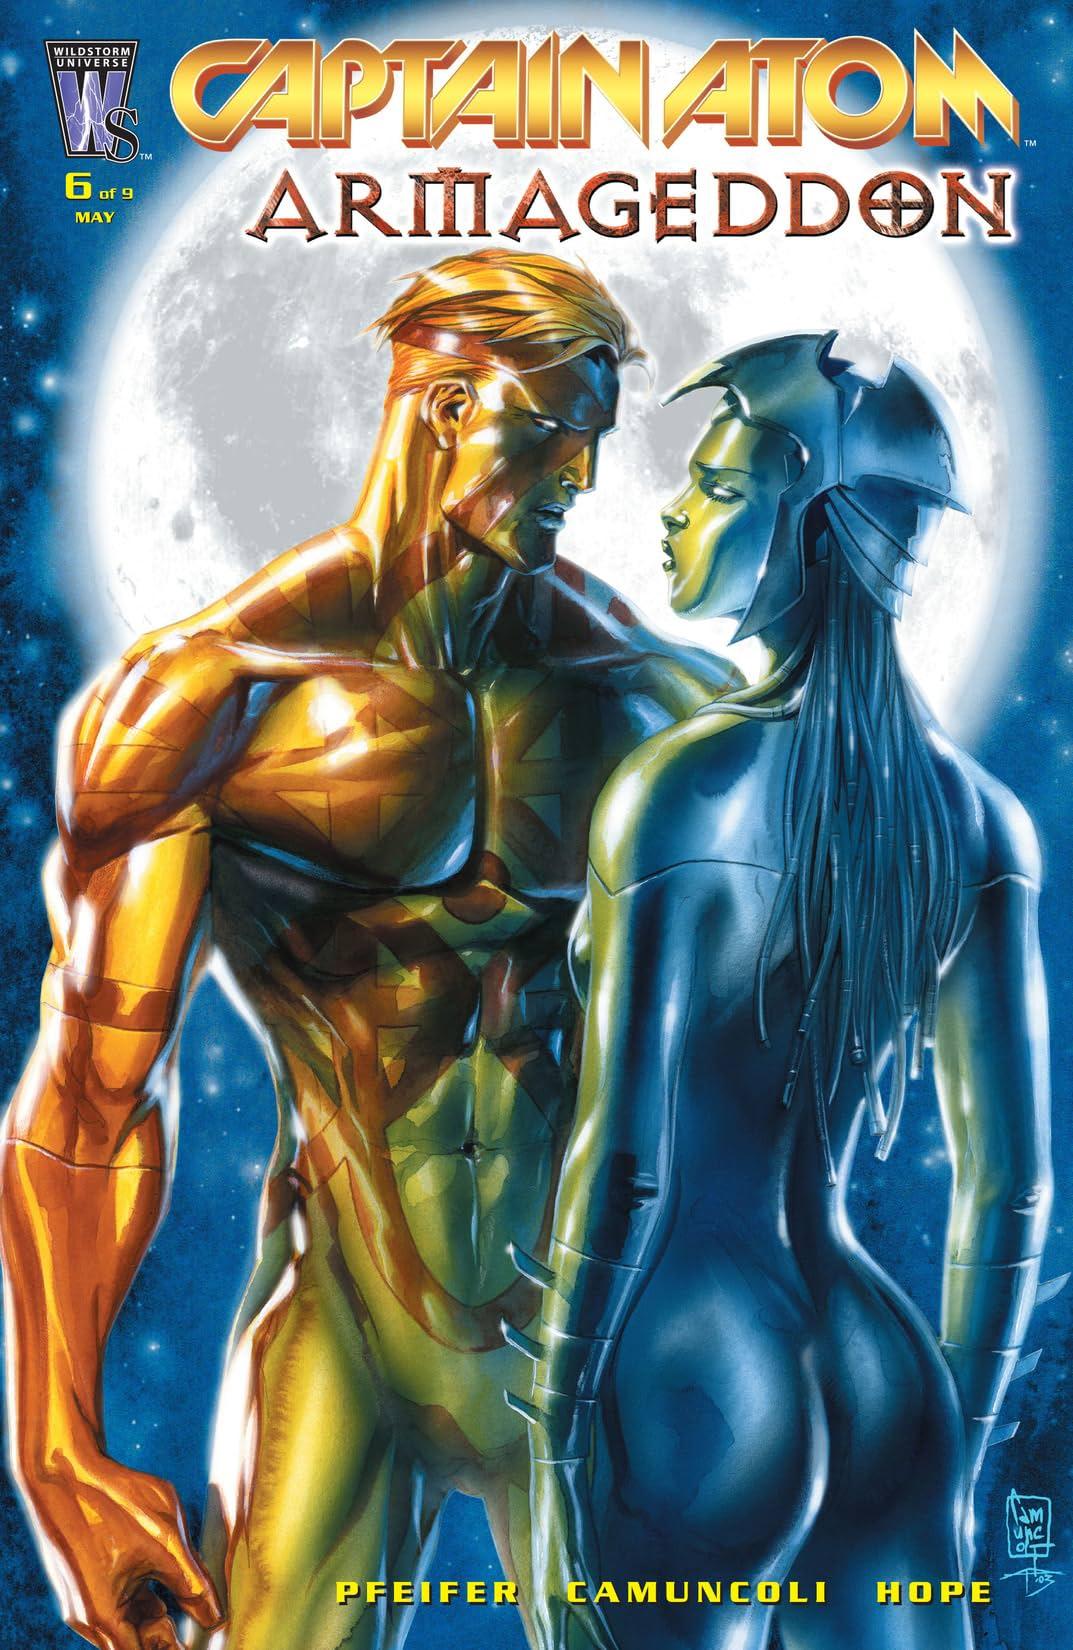 Captain Atom: Armageddon (2005-2006) #6